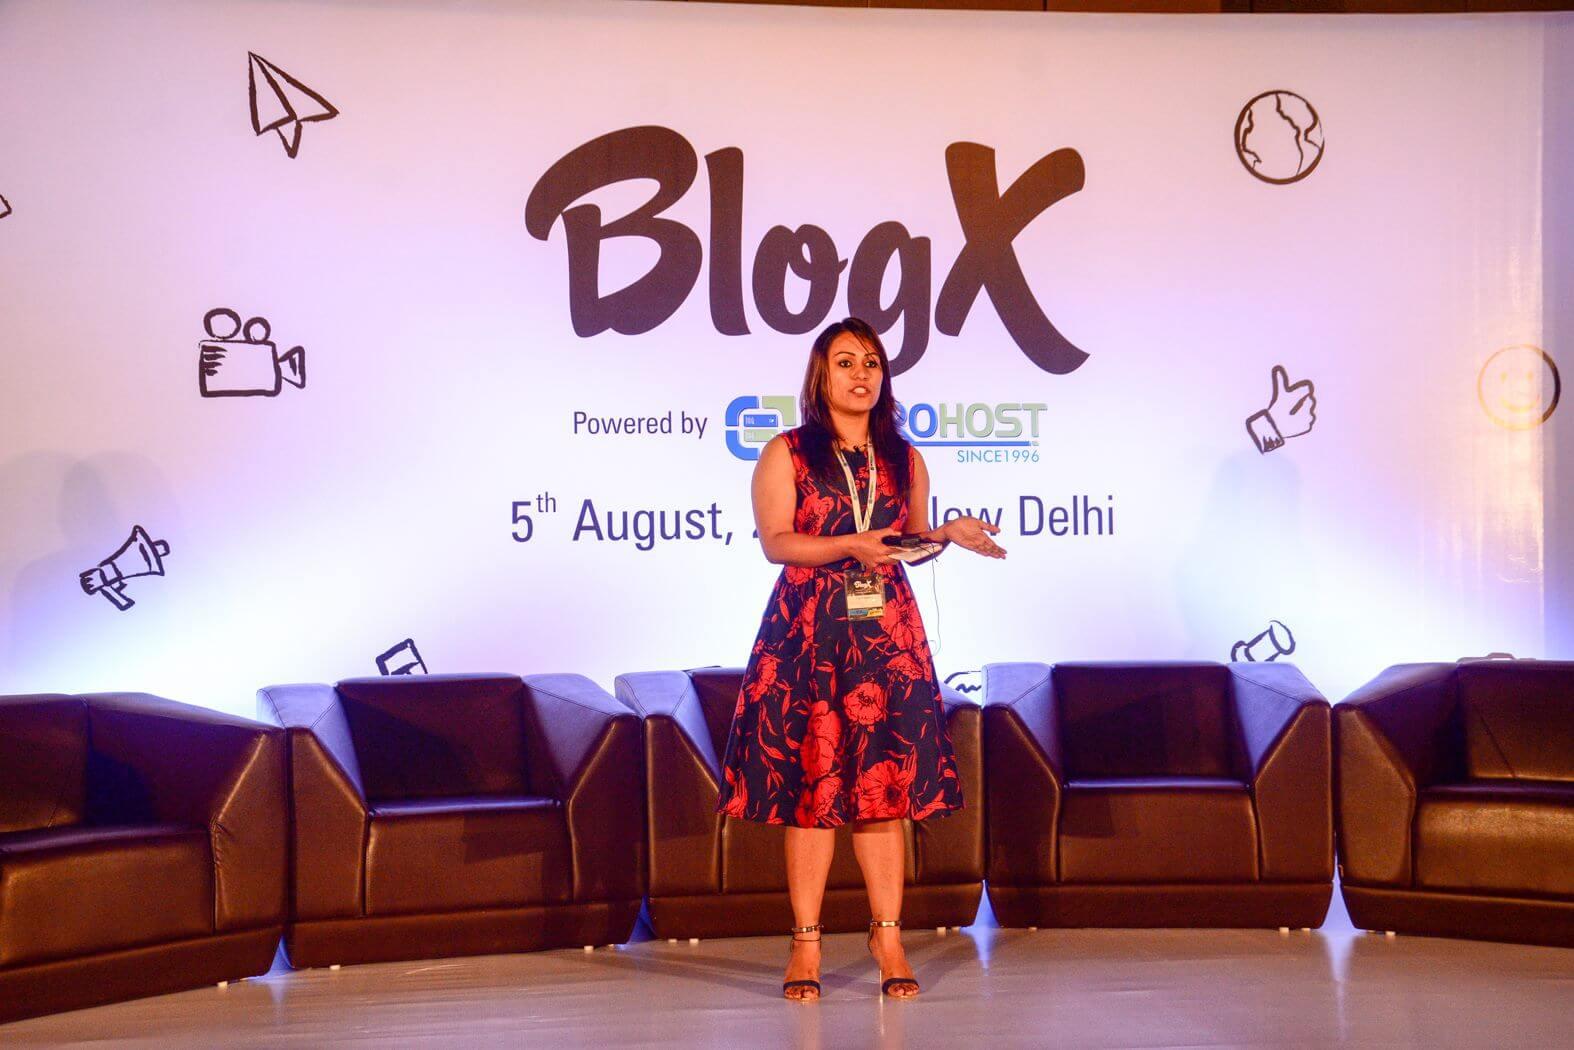 preet sandhu speaking at blogx